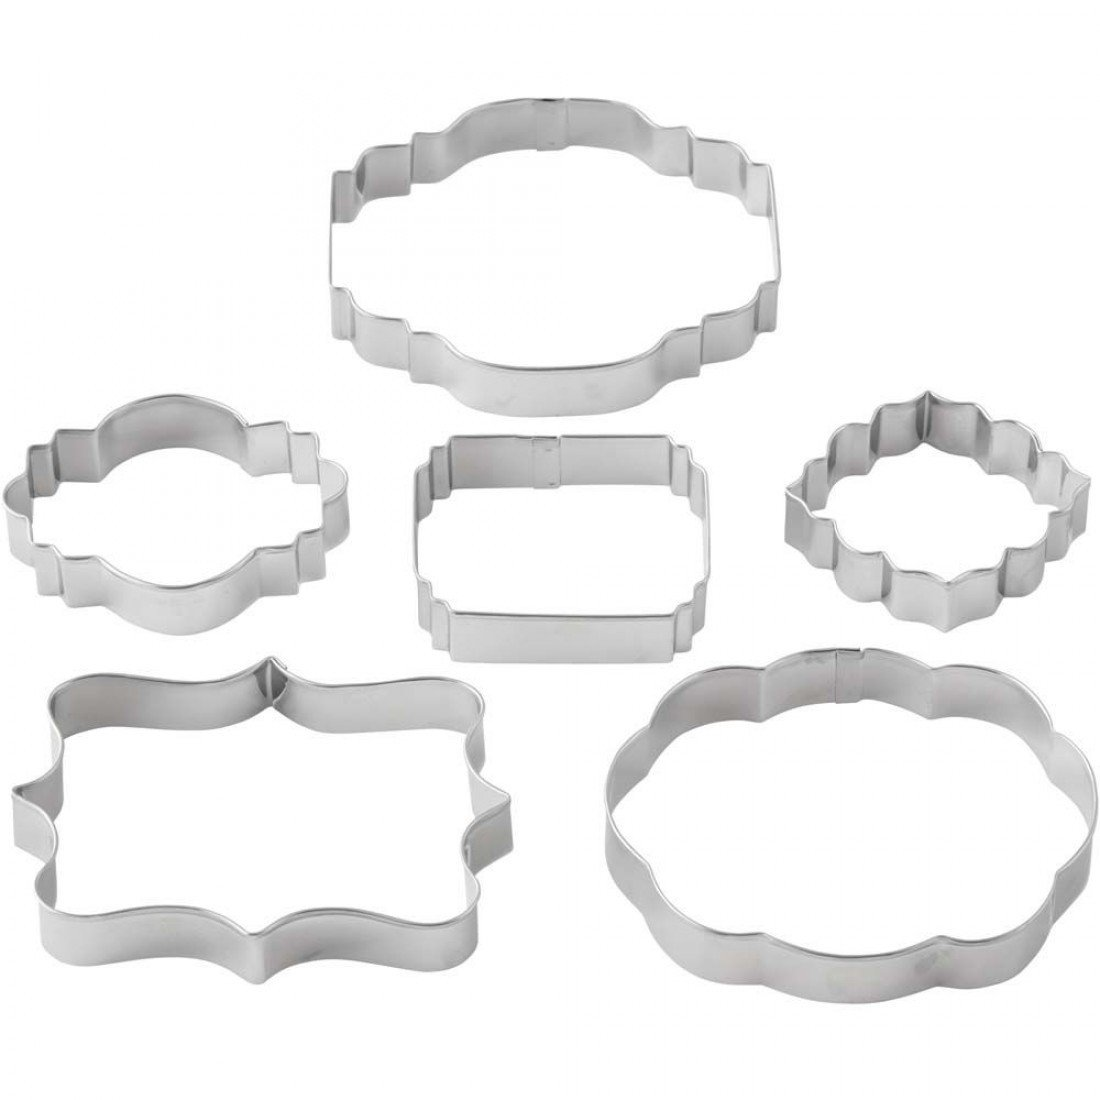 Wilton Cookie Cutter Set of 6 -GEOMETRIC FRAME/PLAQUE - Σετ 6τεμ Γεωμετρικά κουπ πατ Κορνίζες/πλάκες